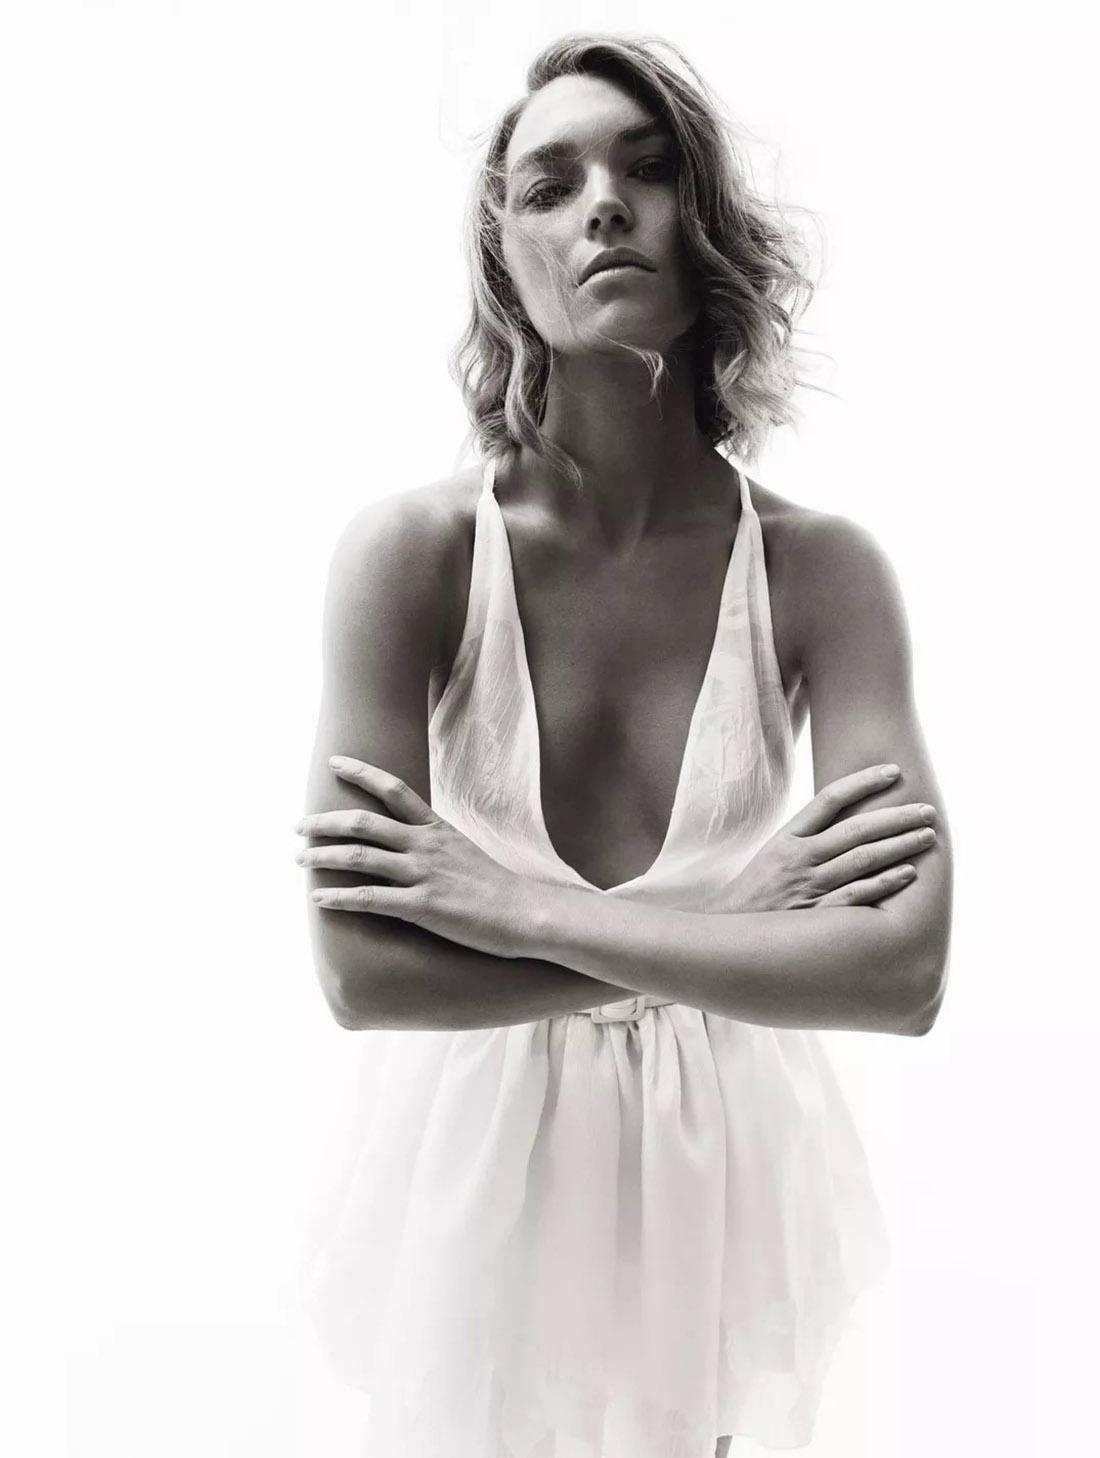 Arizona Muse covers Madame Figaro February 26th, 2021 by Thiemo Sander